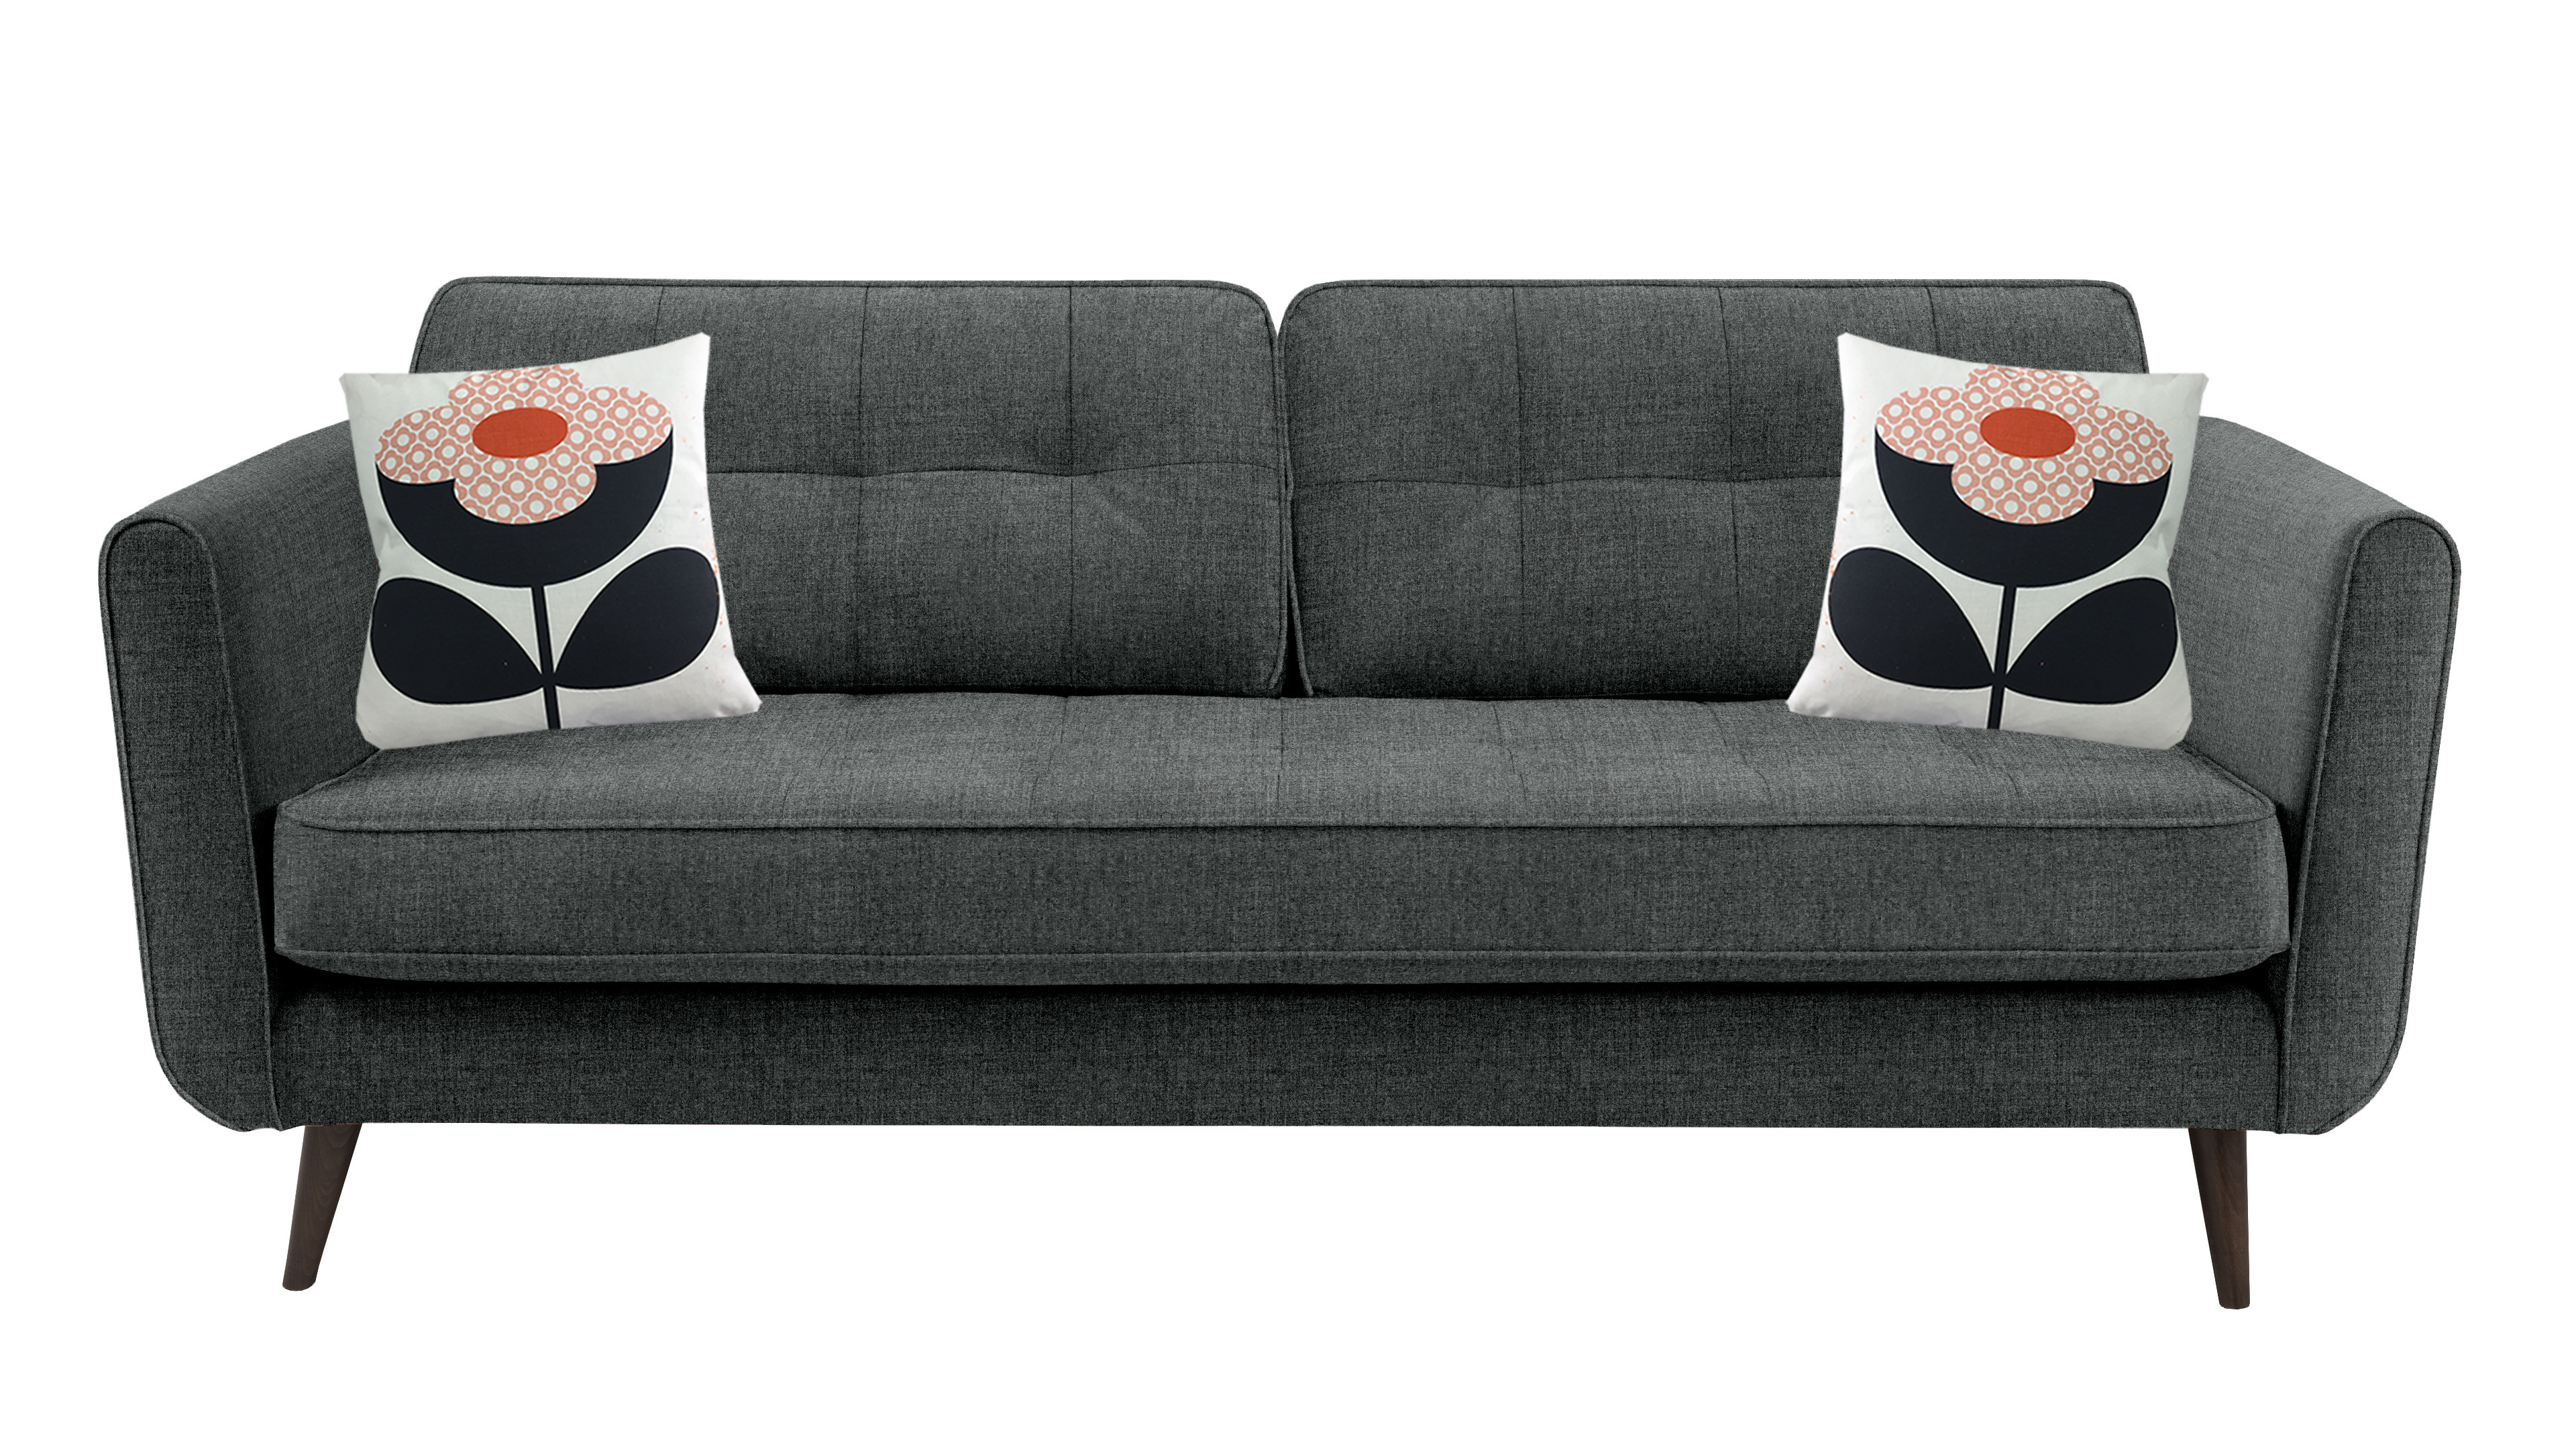 Ivy large Sofa Liffey